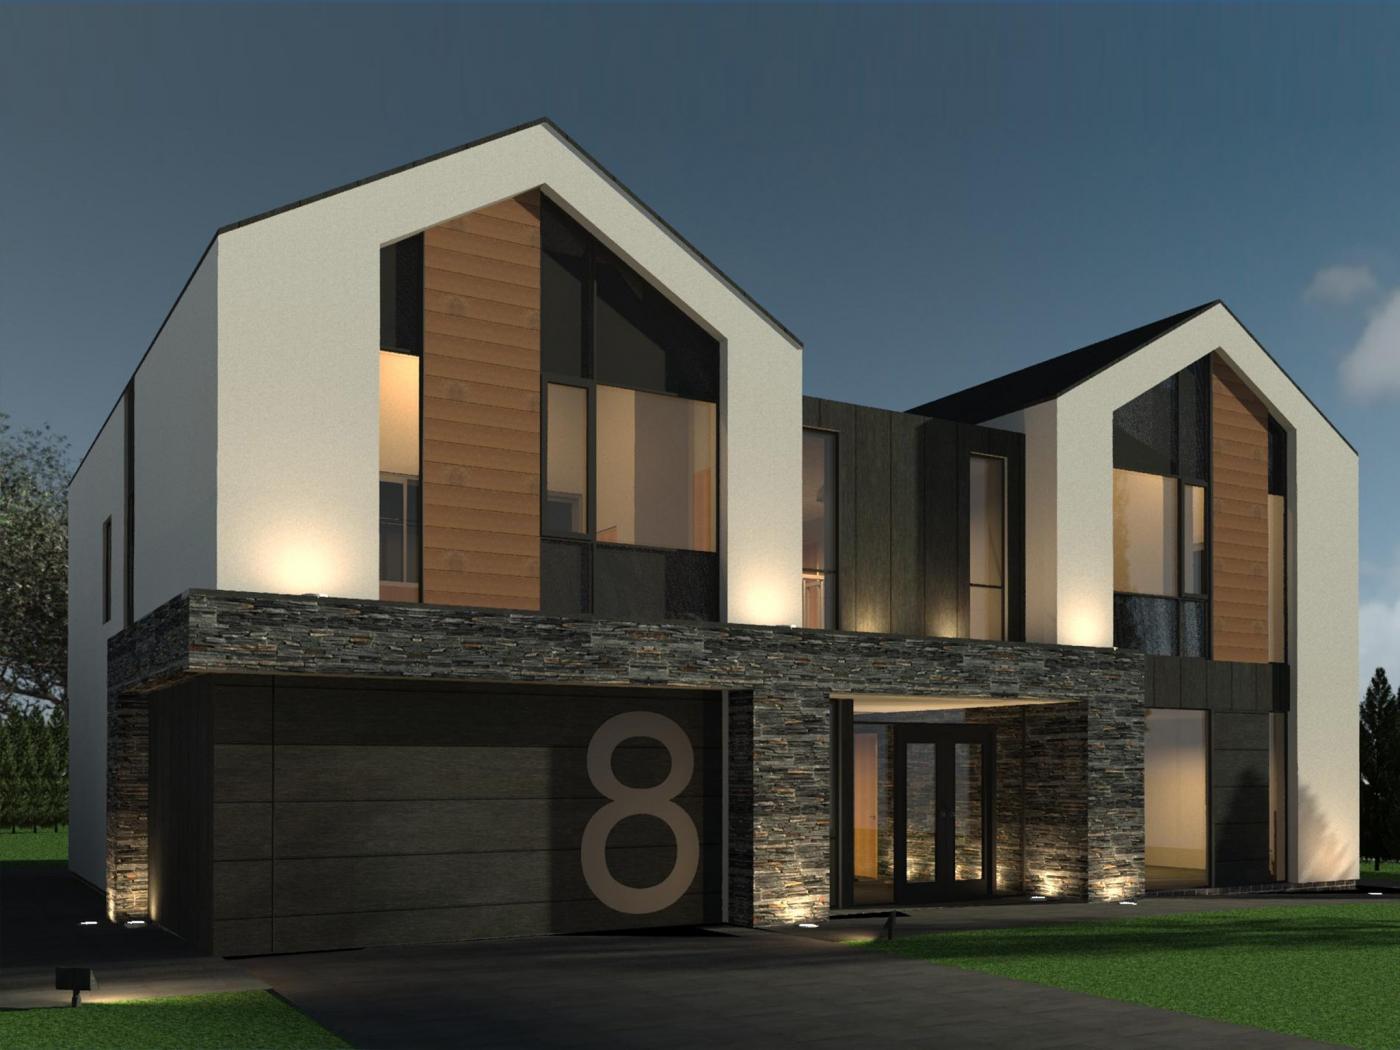 Richardson Residence gains planning permission